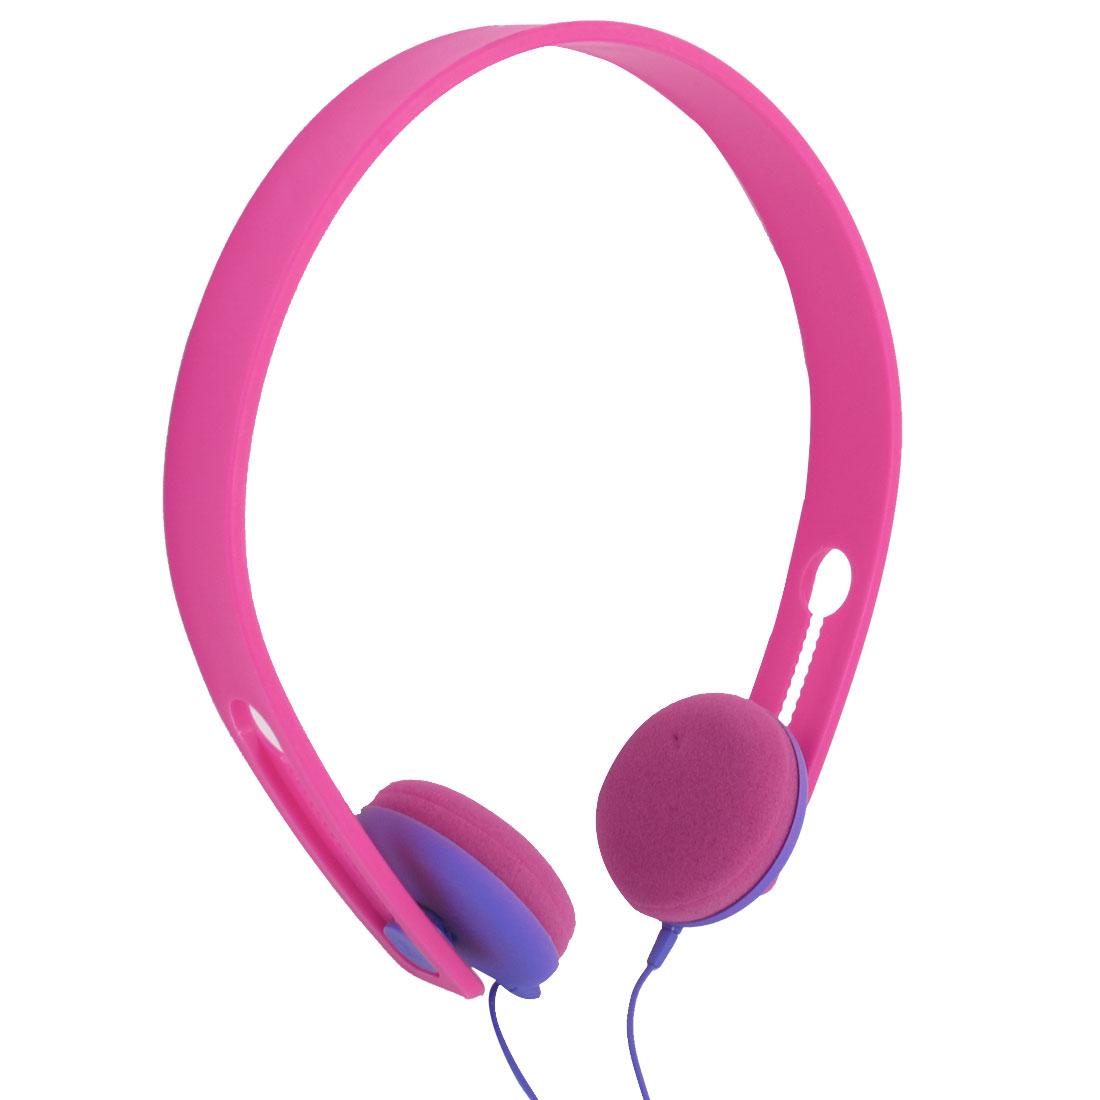 Fuchsia Purple 3.5mm Plug Bass Headset Headphone for Laptop Desktop Tablet